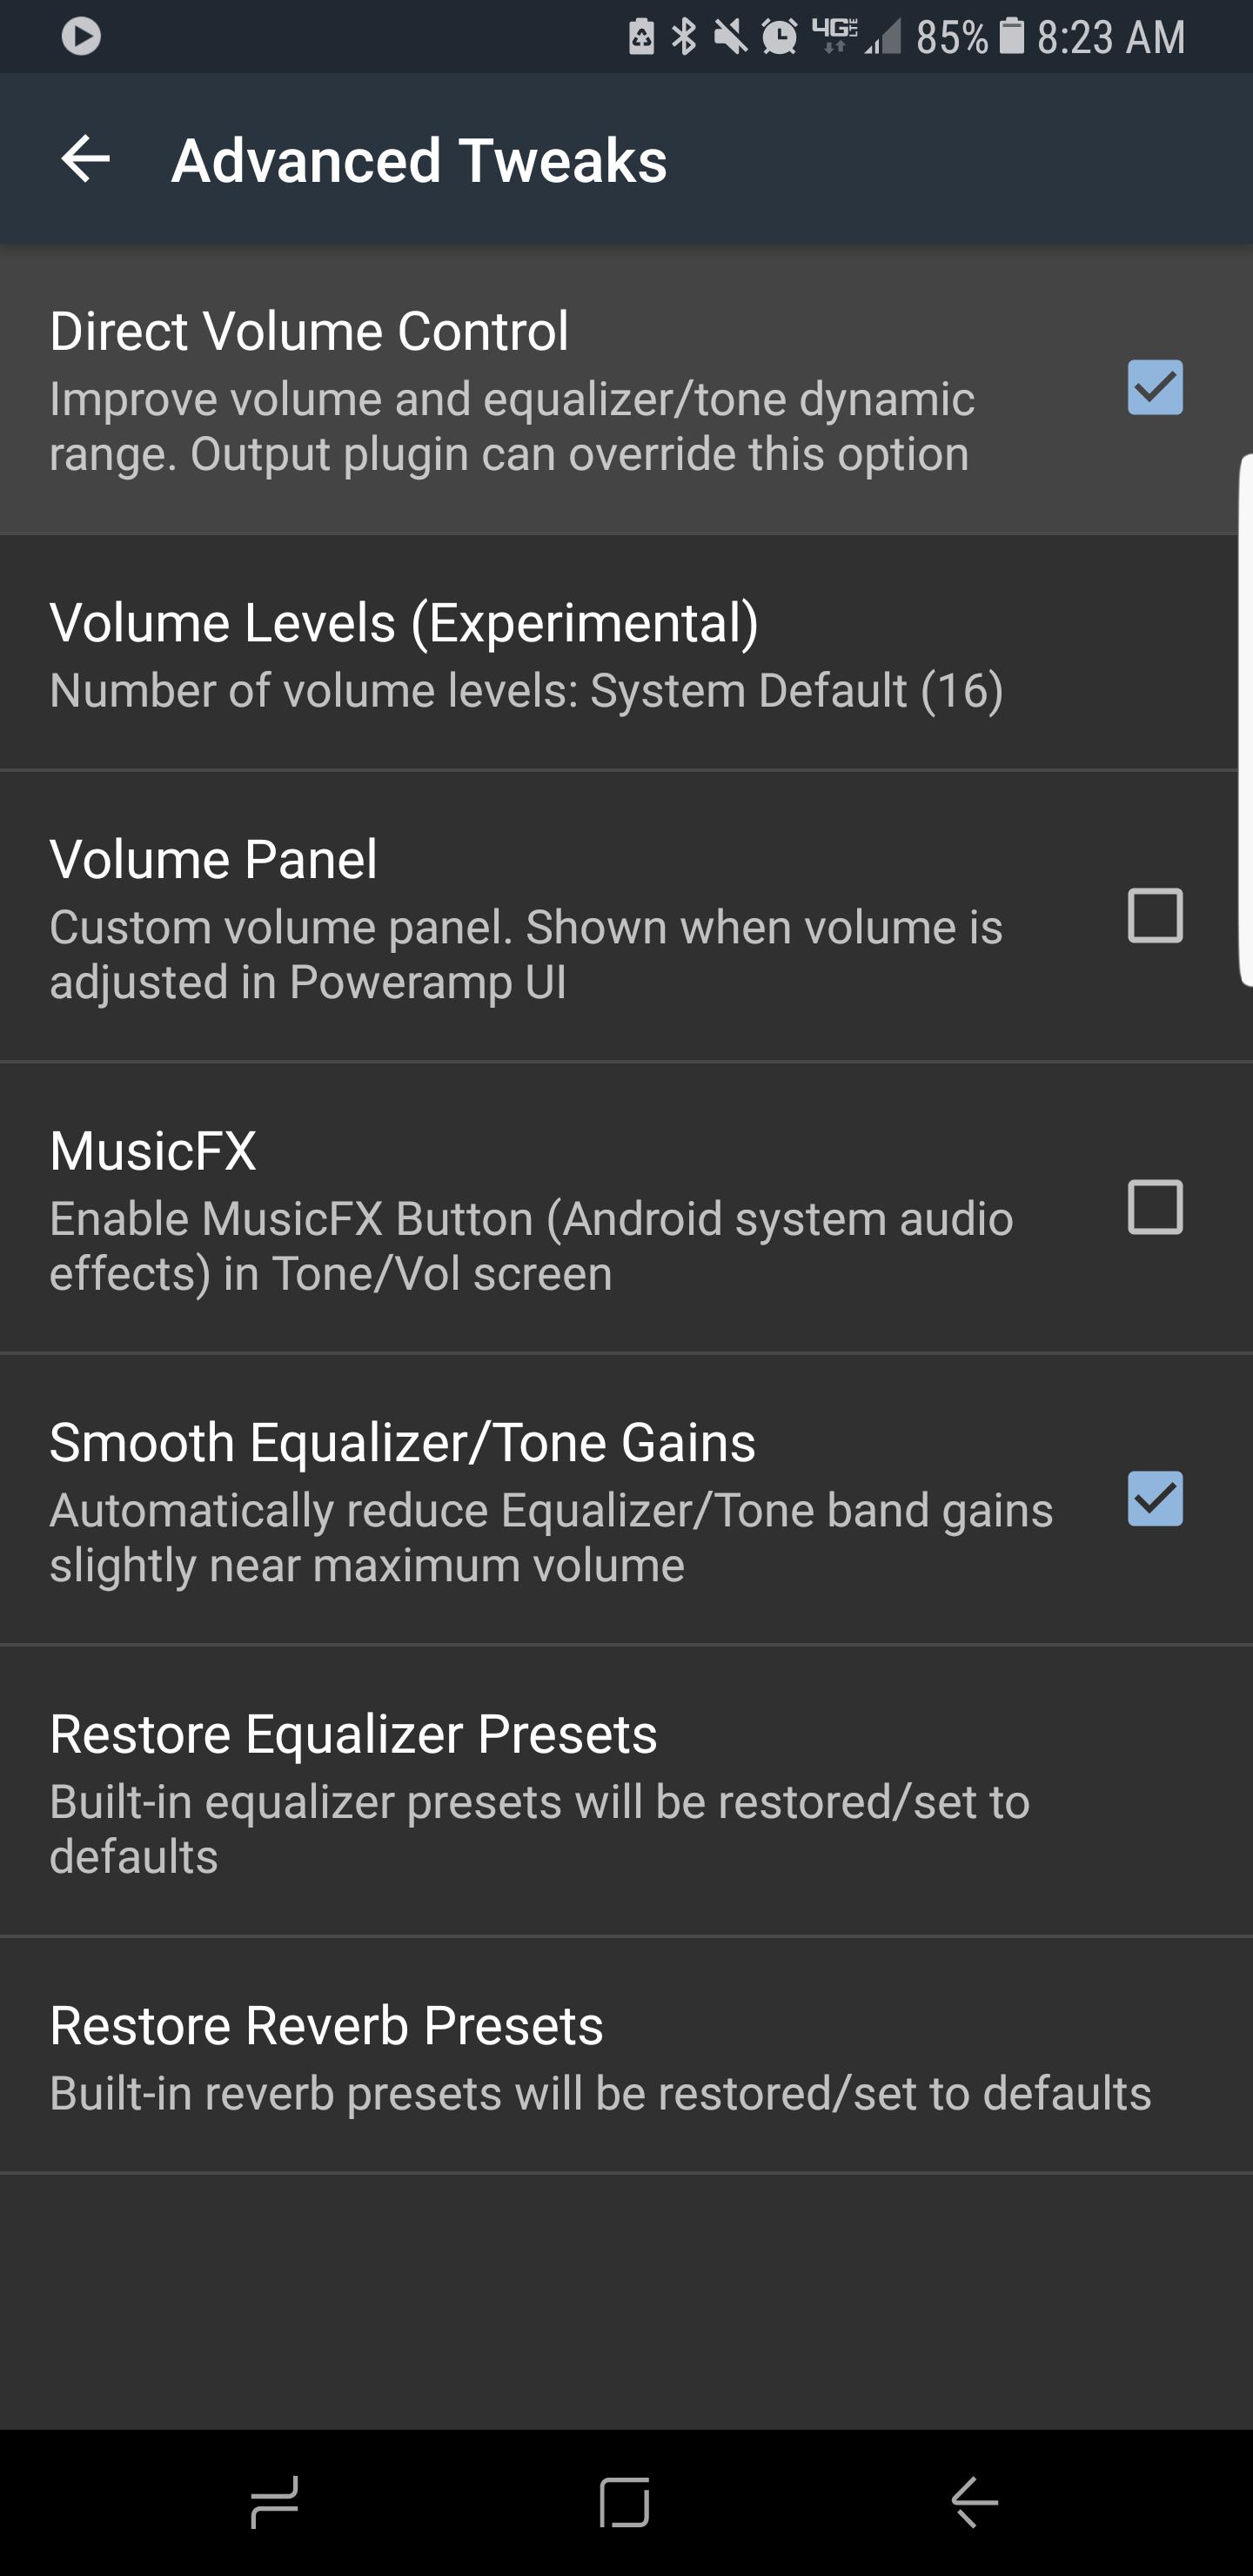 Galaxy S8 Bug Reports Poweramp V3 Volume Controlpng Screenshot 20170601 082320